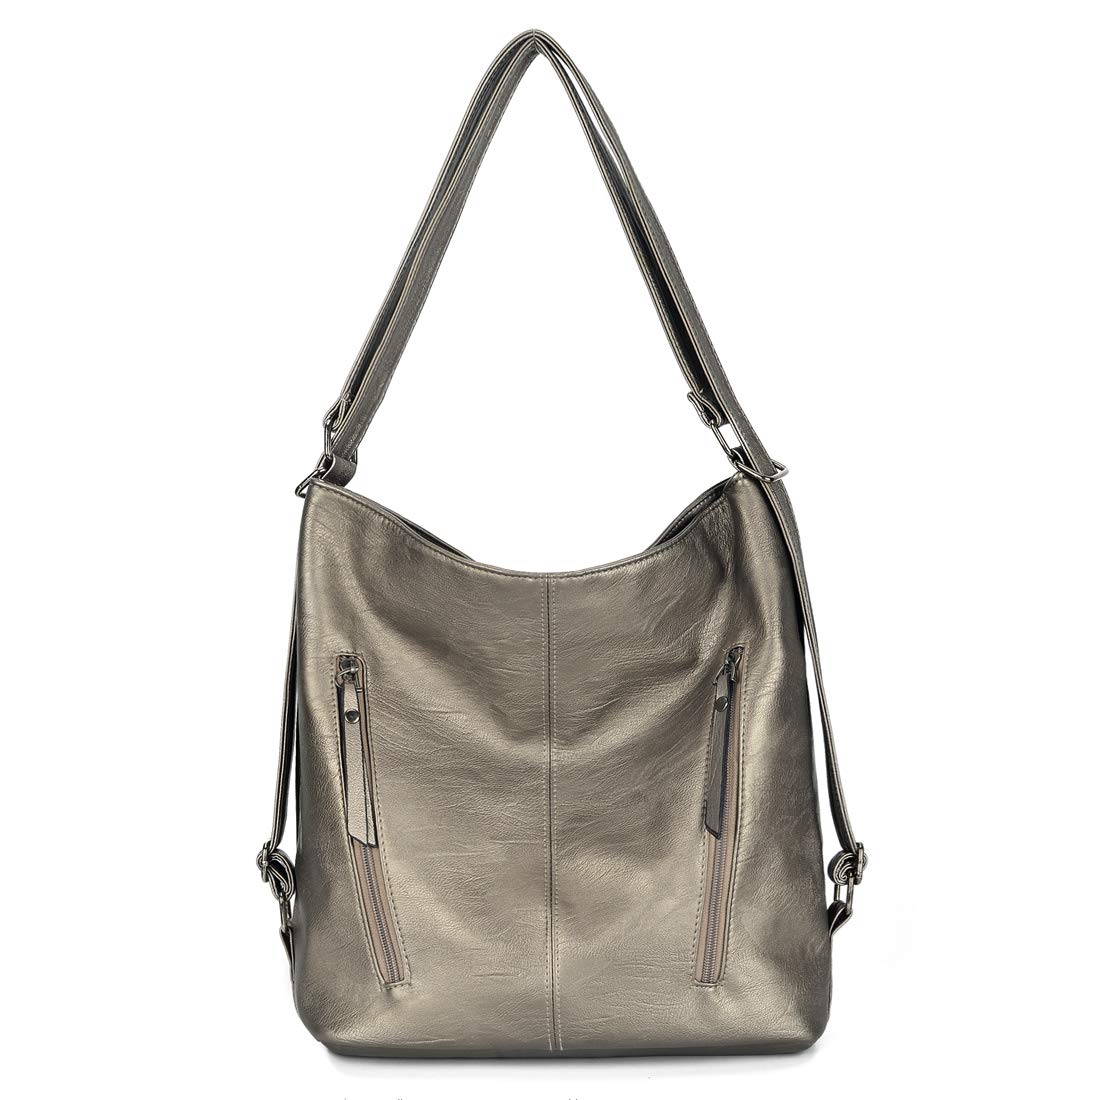 Artwell Women Shoulder Bag Convertible Backpack Purse PU Leather Hobo Style Handbag Totes (Bronze)